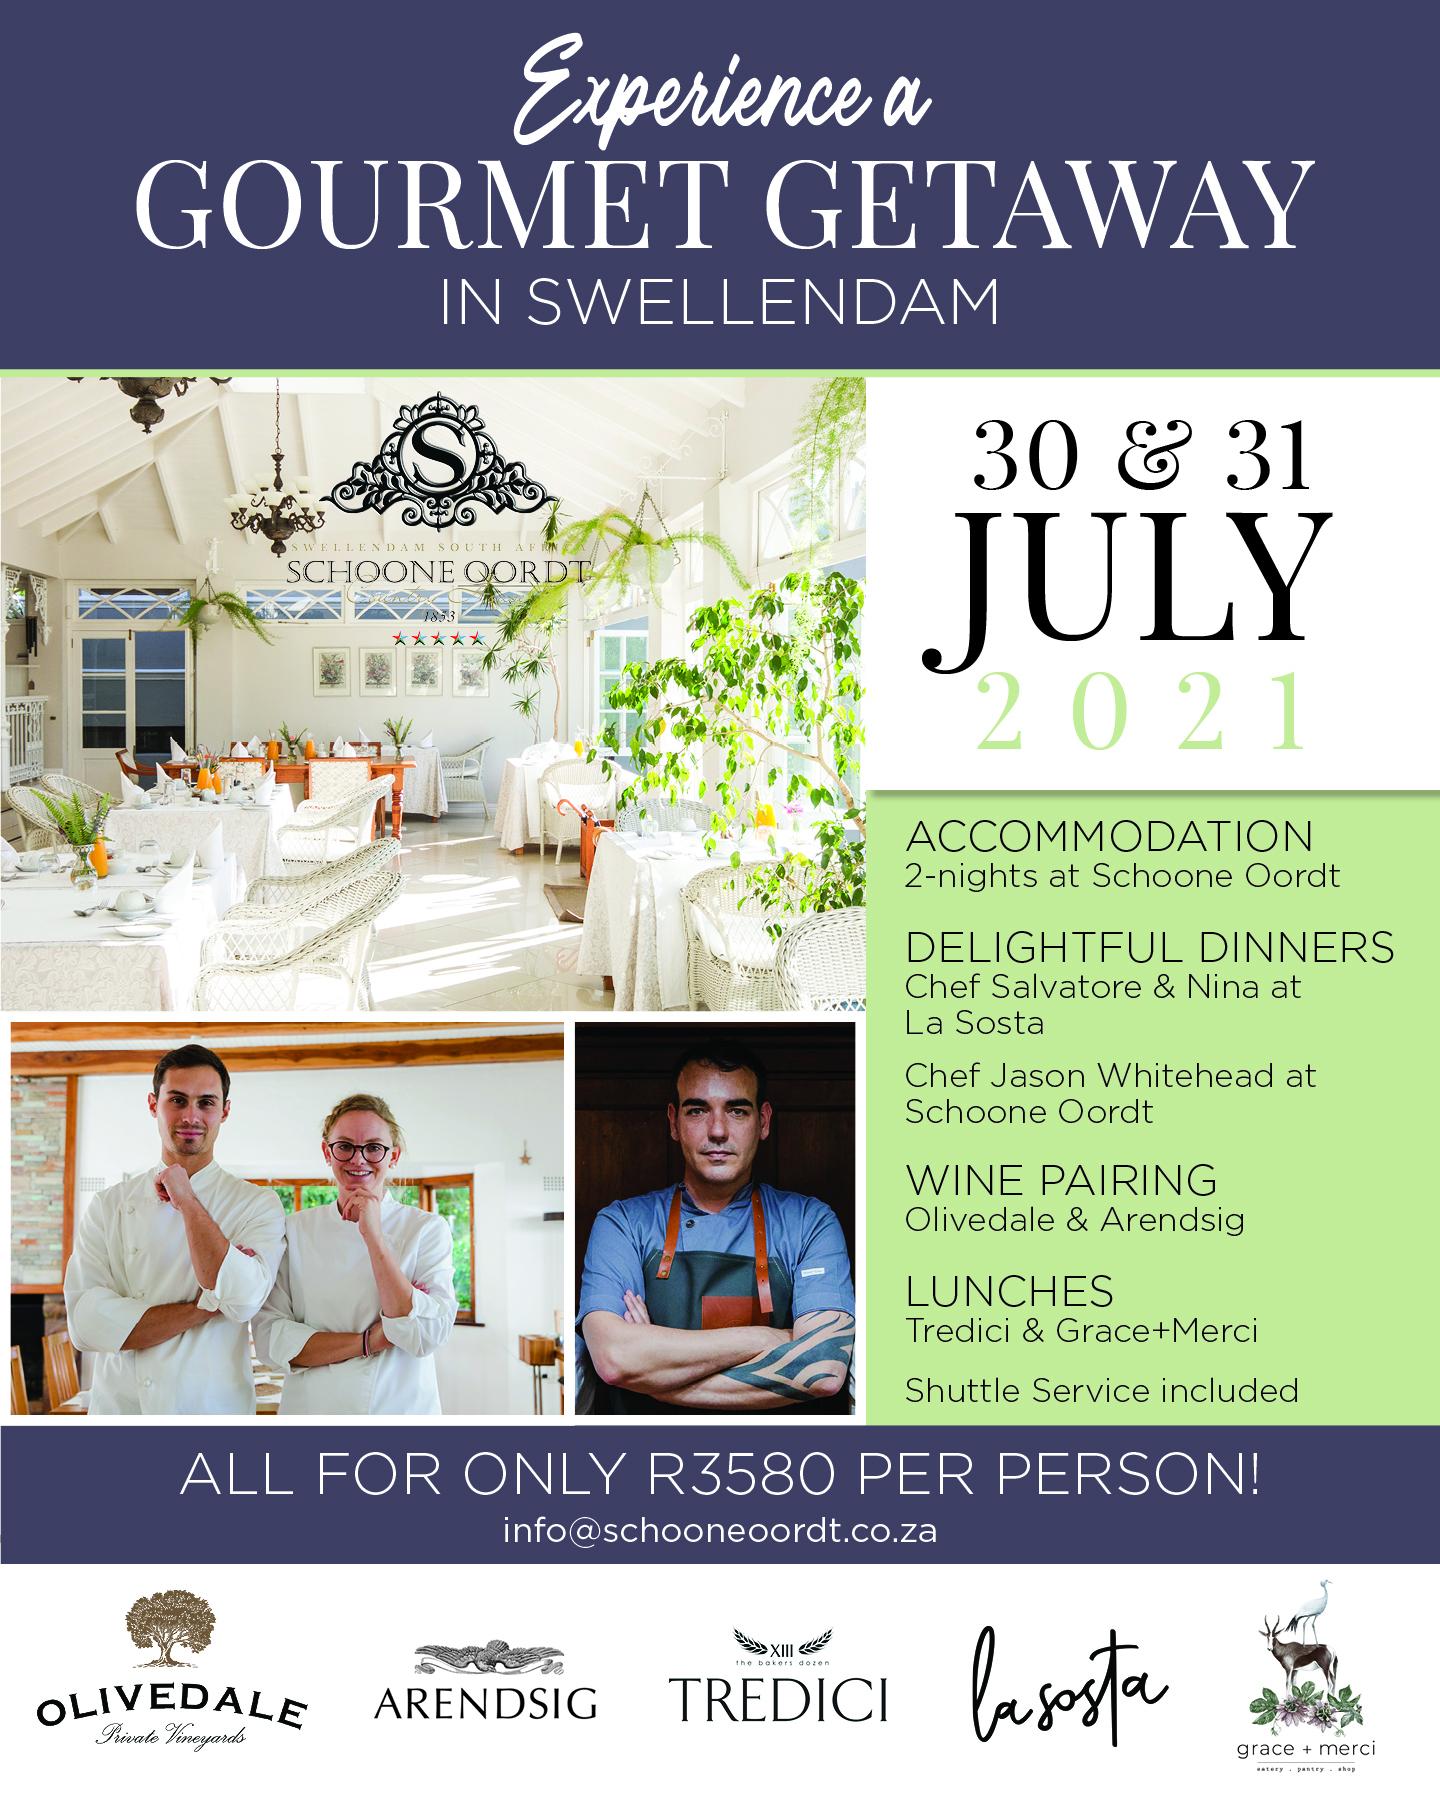 Gourmet Getaway Swellendam